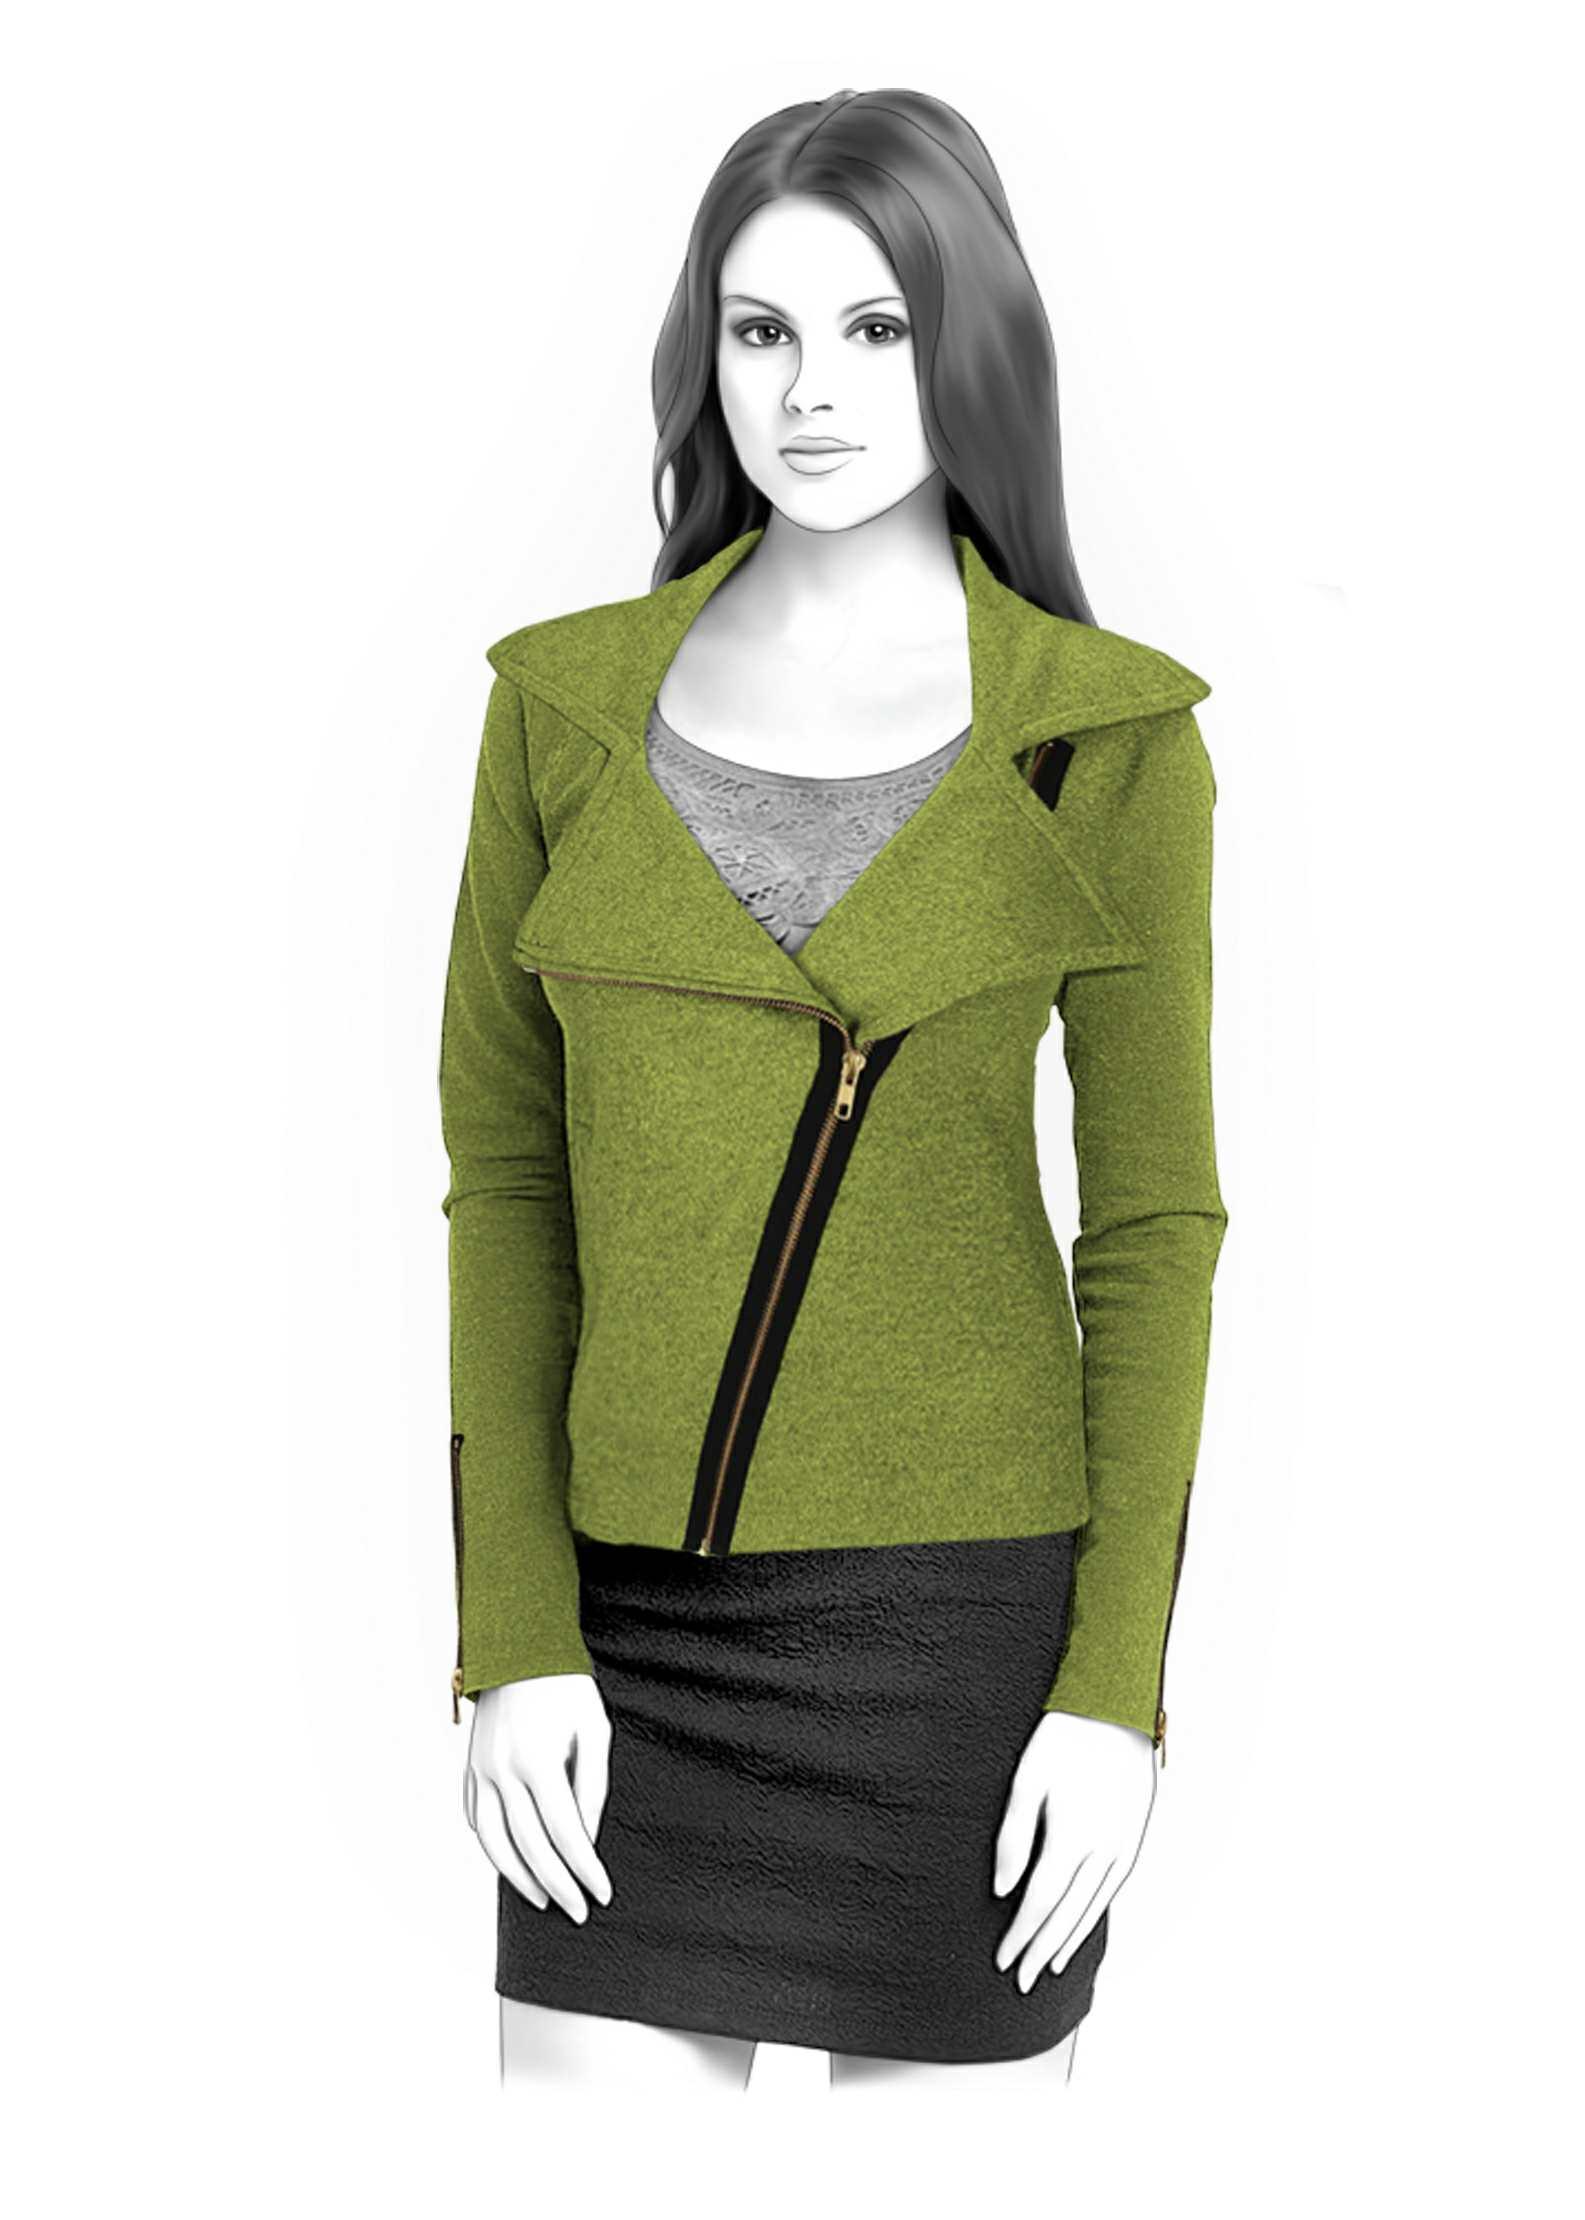 Sweatshirt - Sewing Pattern #4336  Made-to-measure sewing